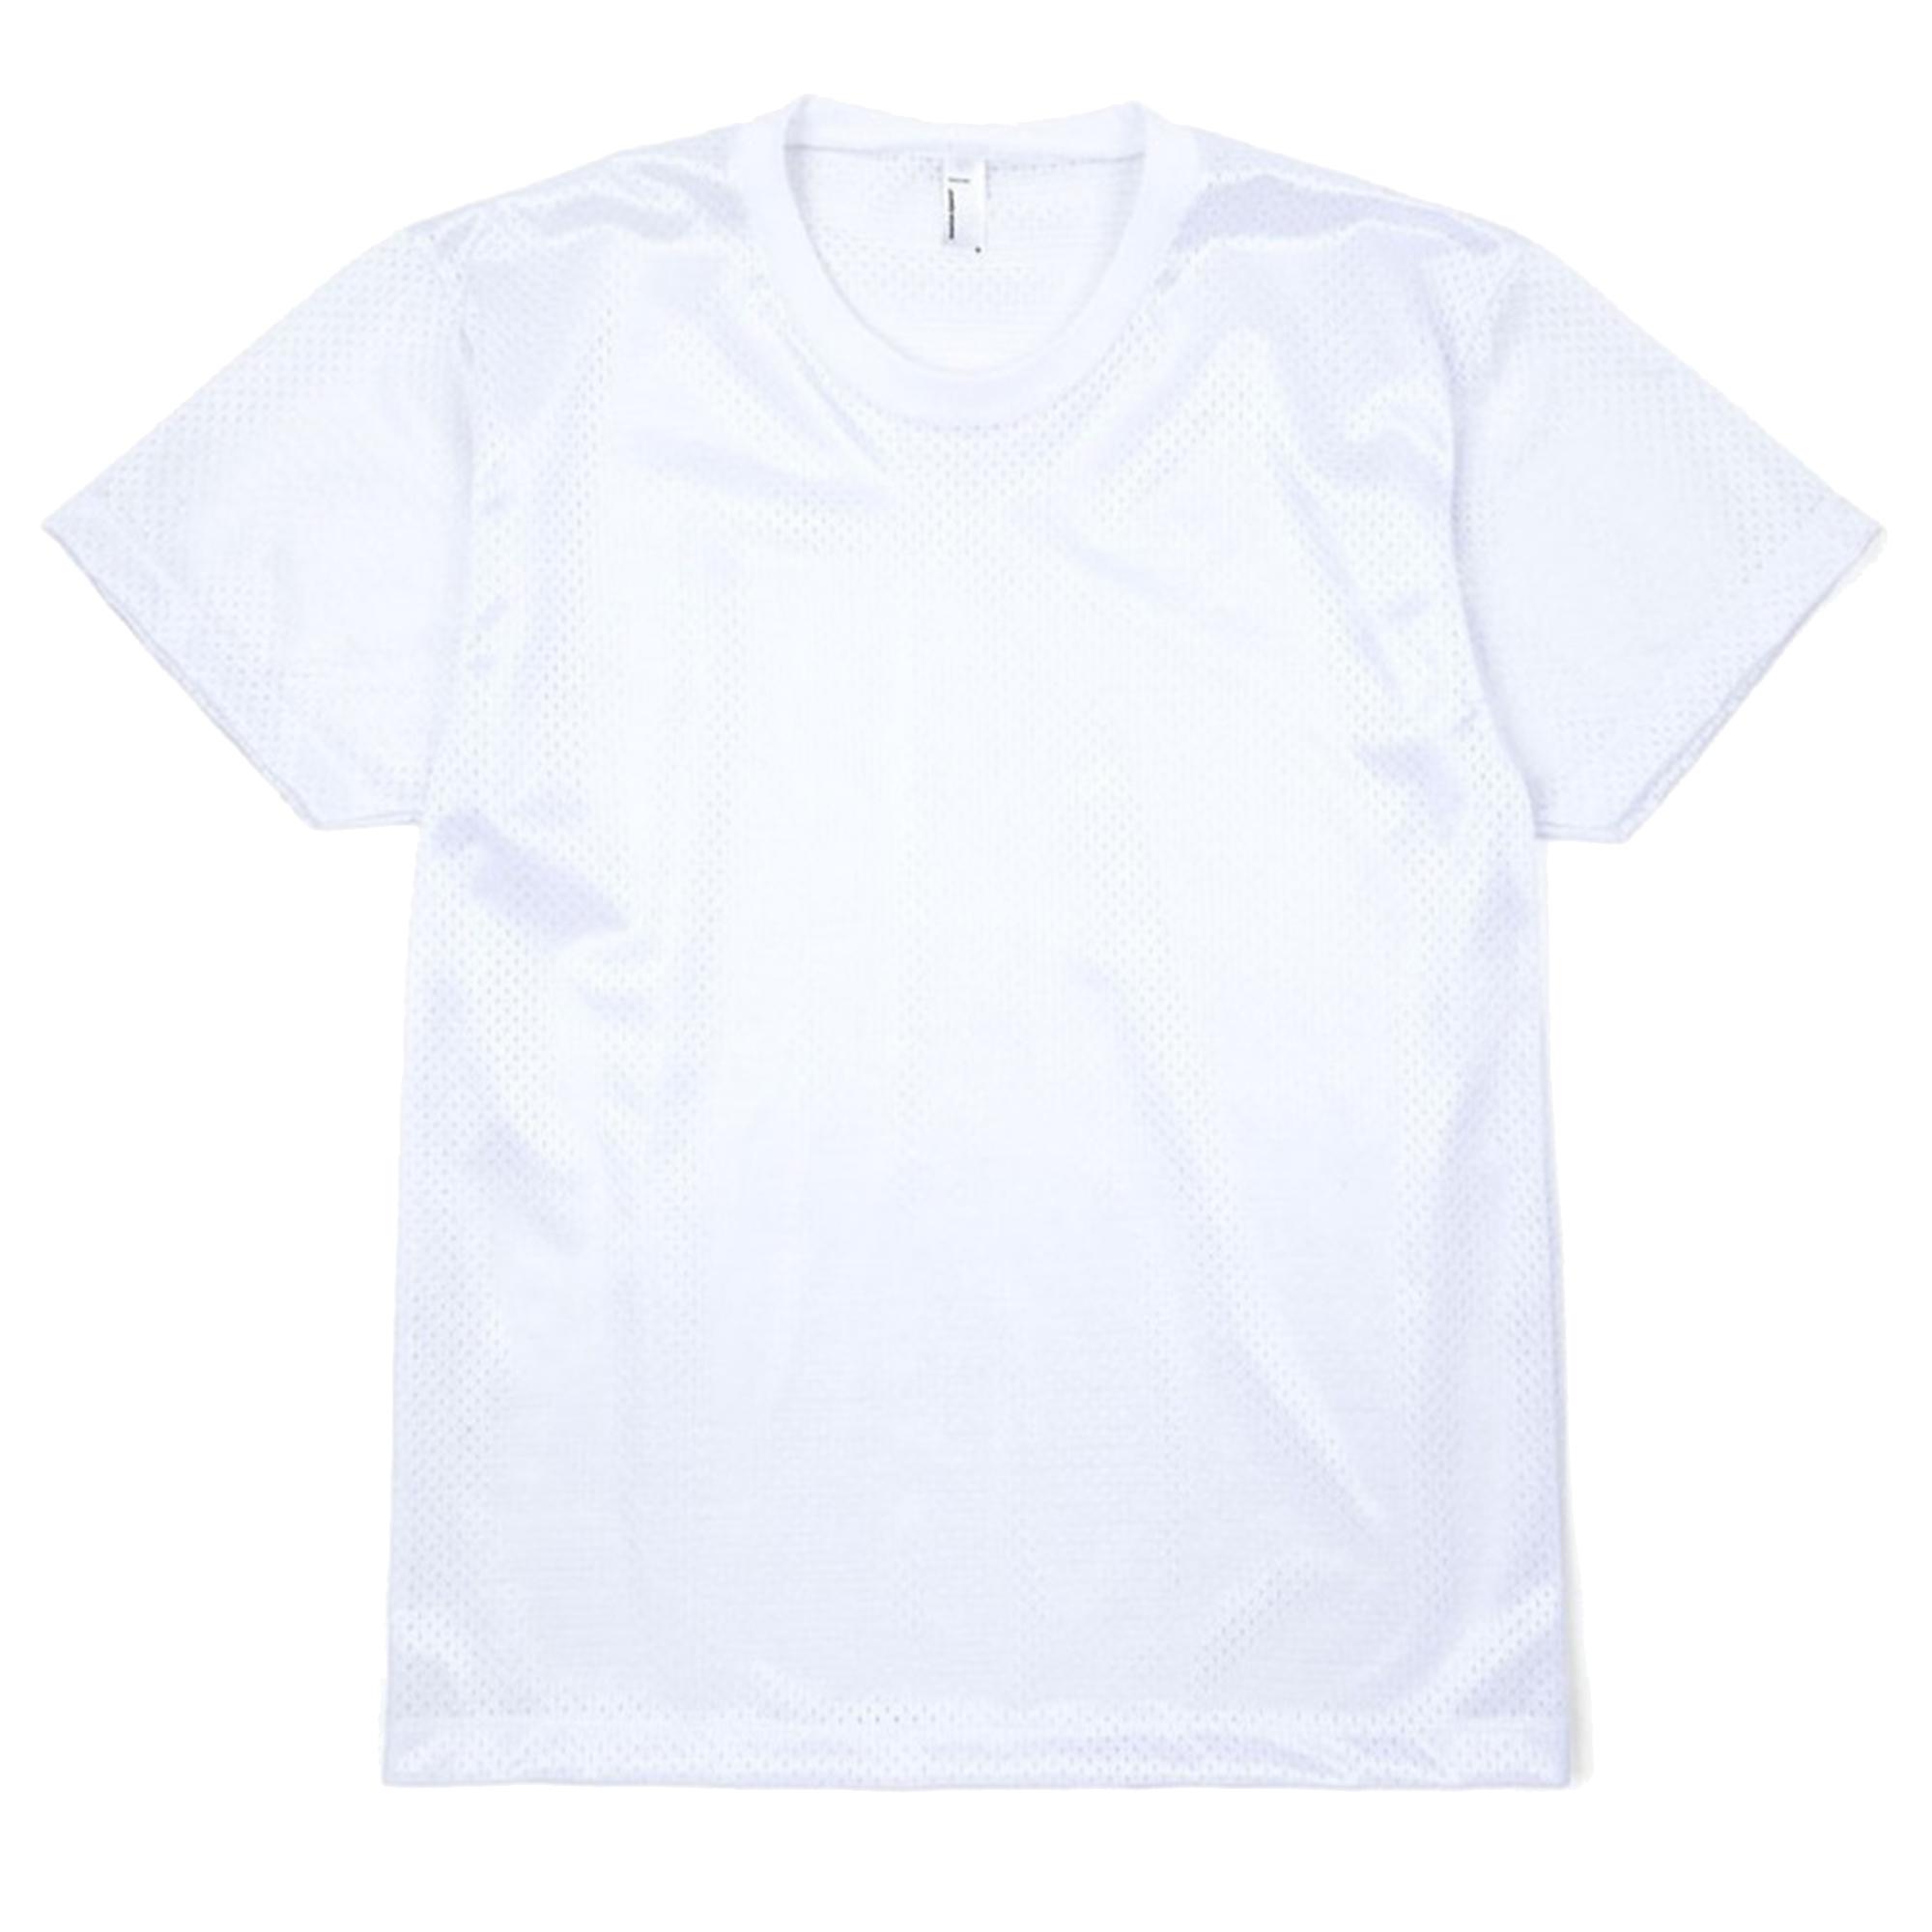 American apparel unisex lightweight short sleeve mesh t for American apparel mesh shirt